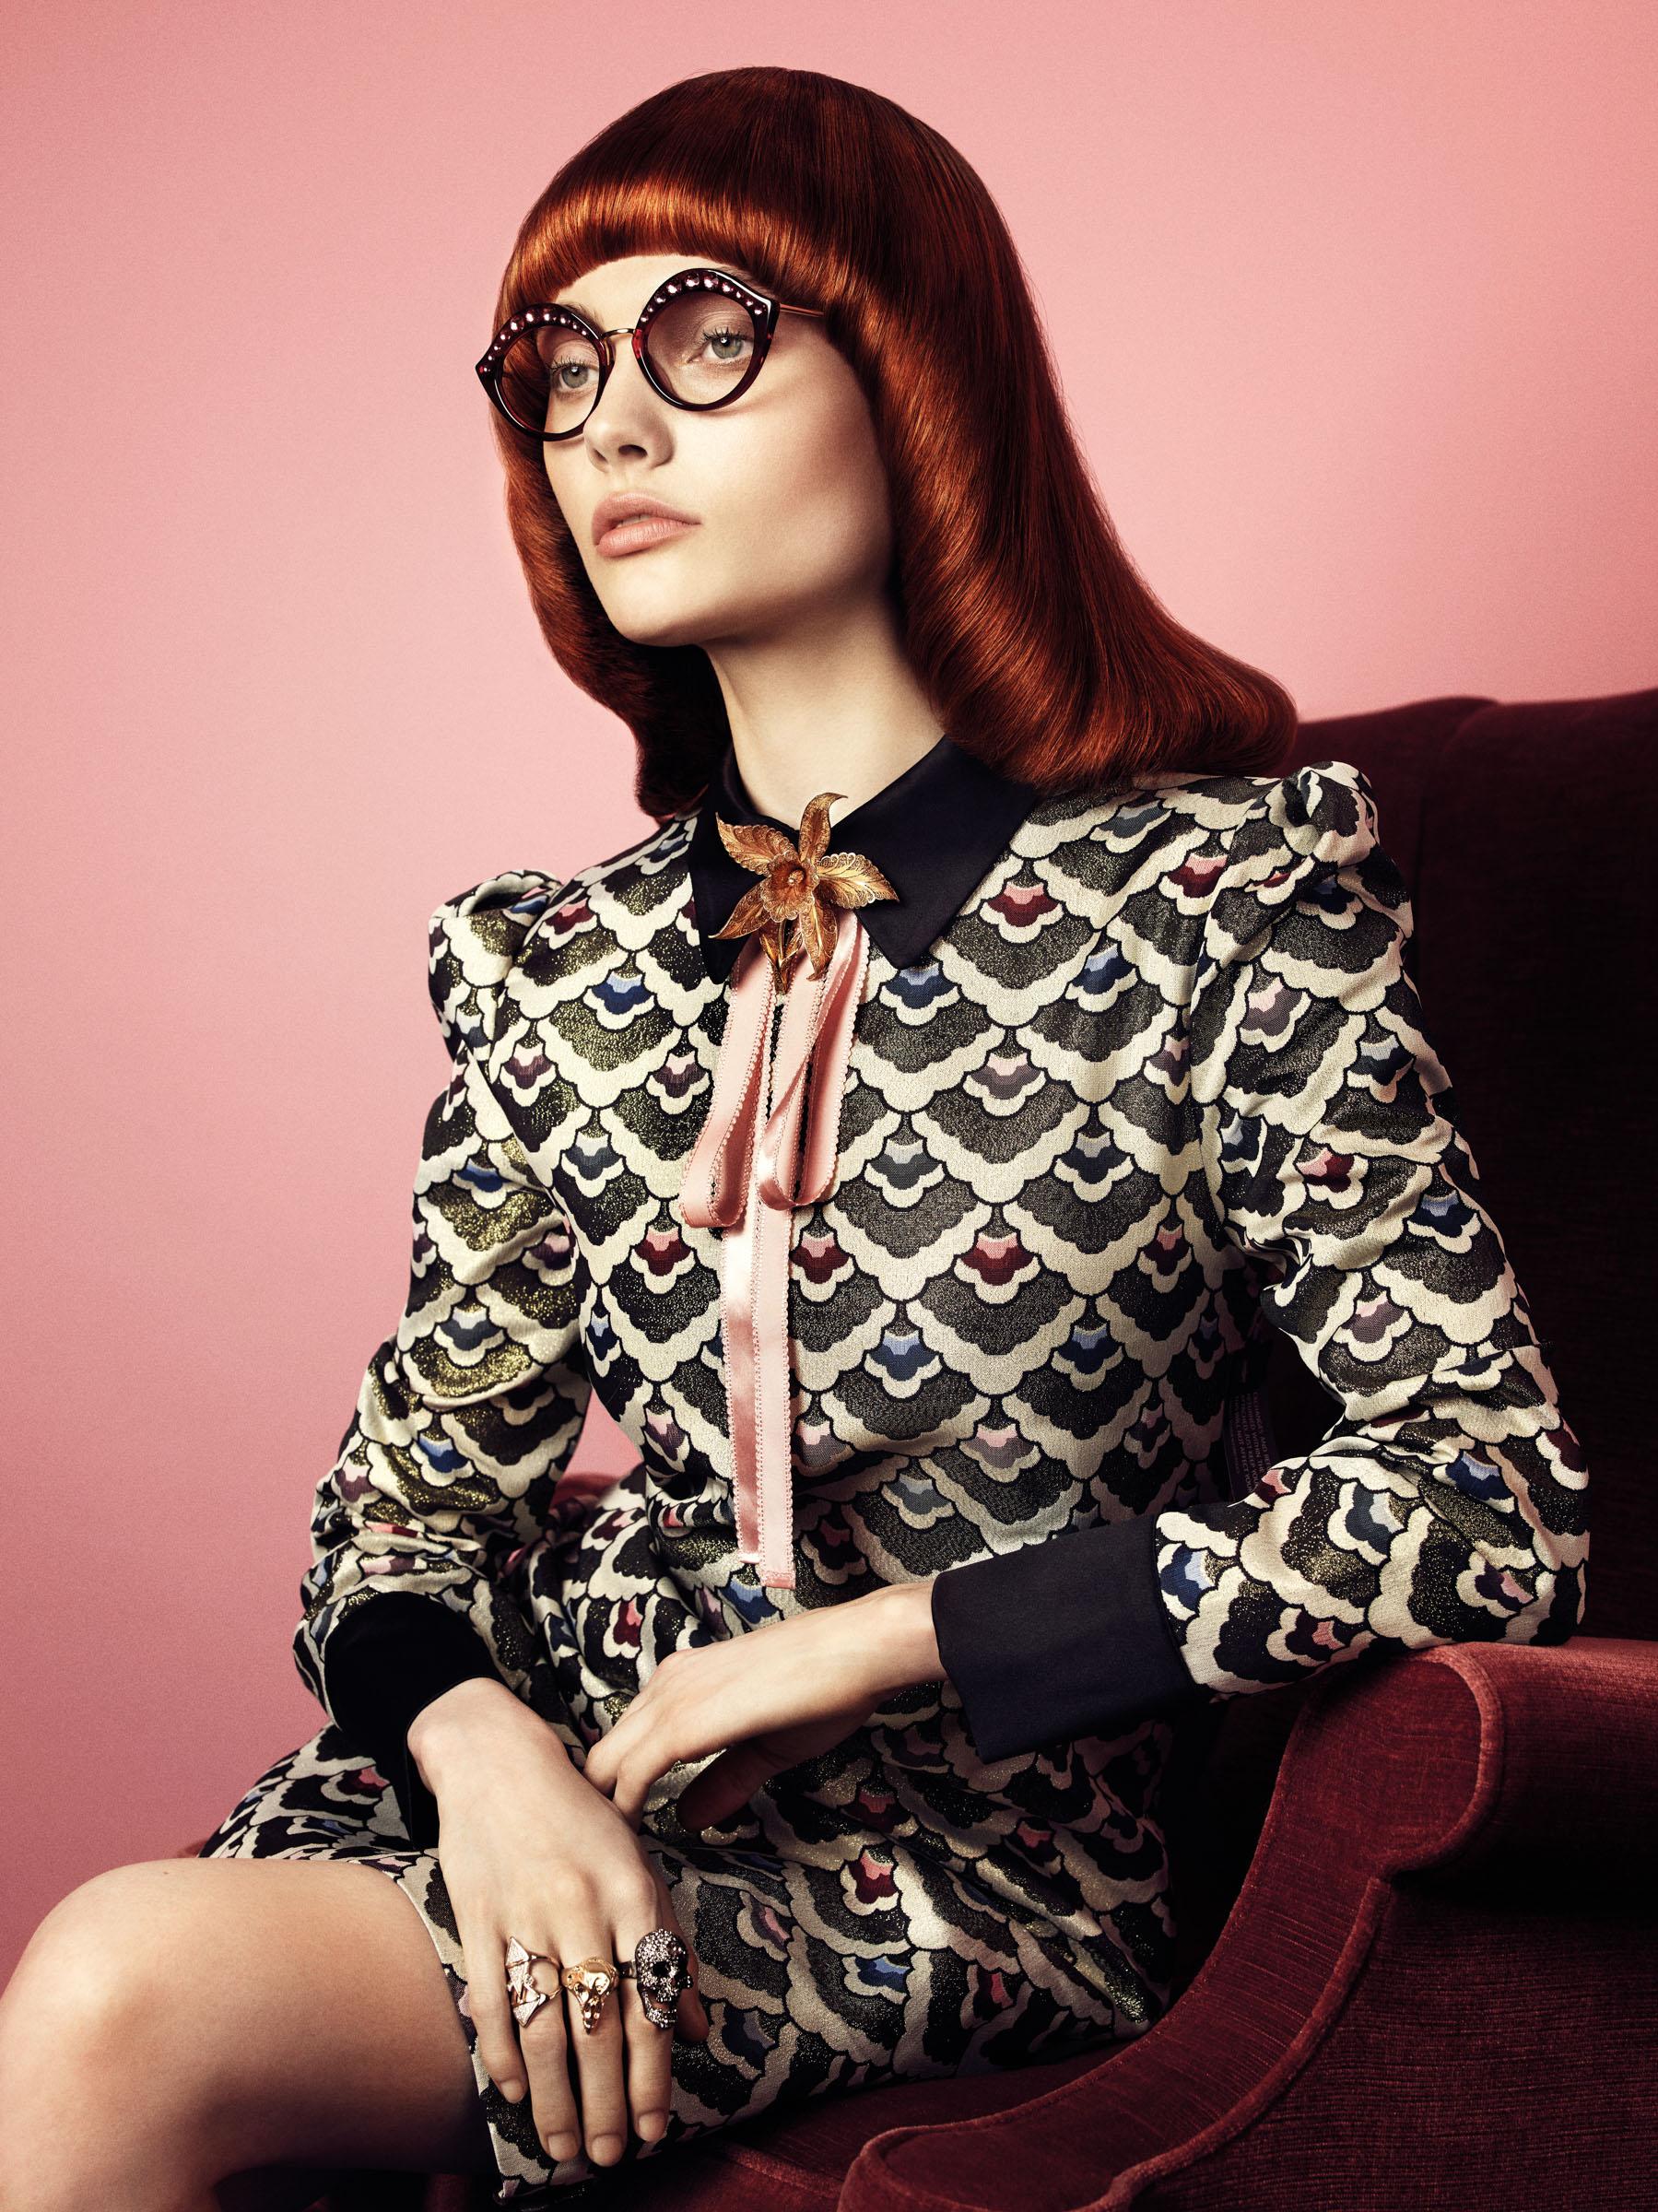 Jack-Eames-Toni-Guy-Hair-Beauty-Photography-Campaign-Pink-Fashion-02.jpg